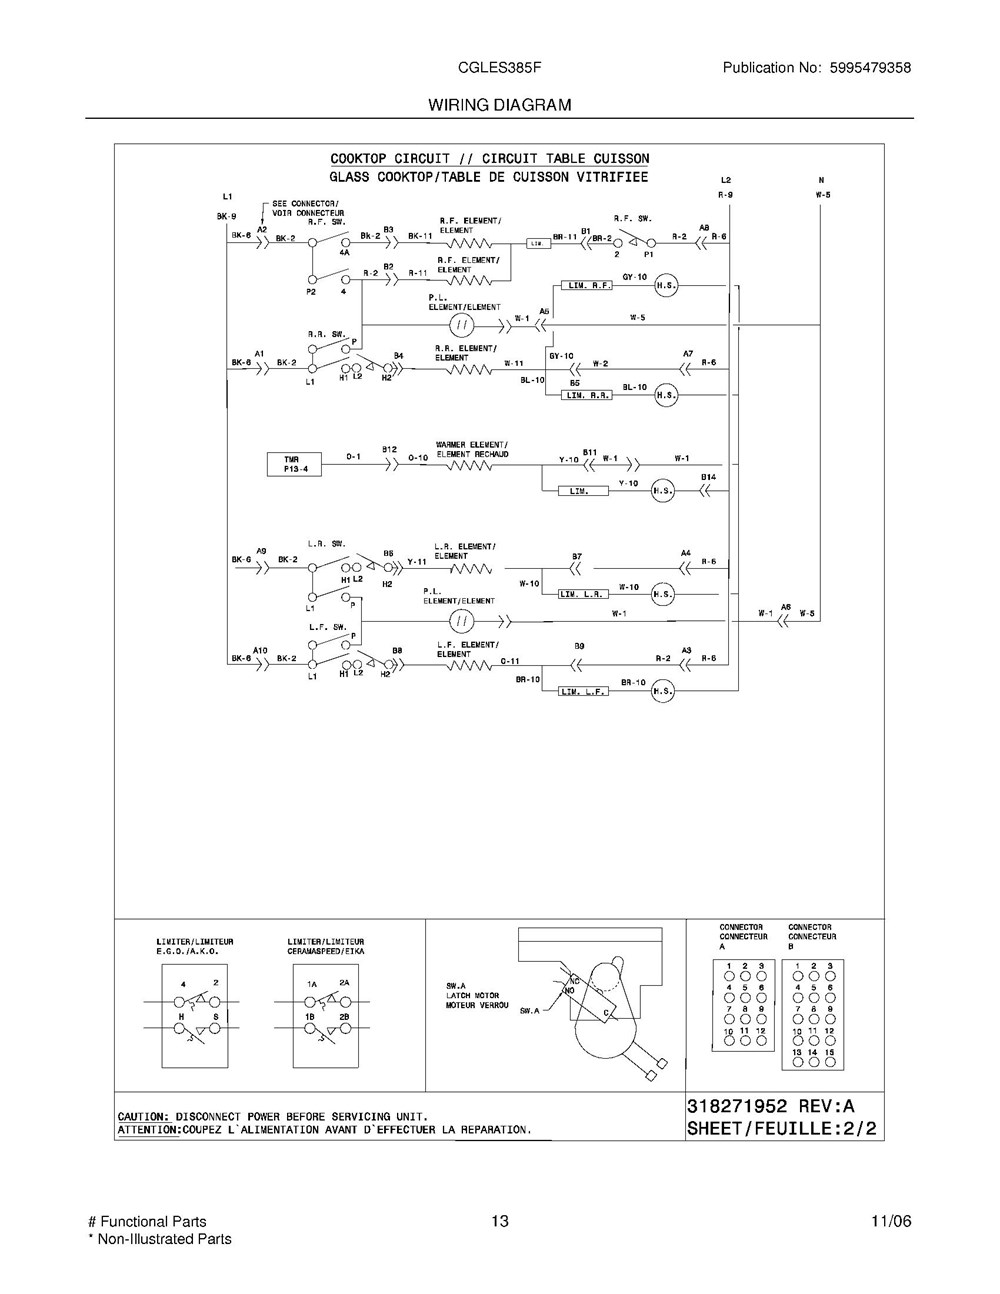 Rcwilley Salt Lake City Utah 801 461 3900 07top Drawer 09door 01cover 10wiring Diagram 11wiring